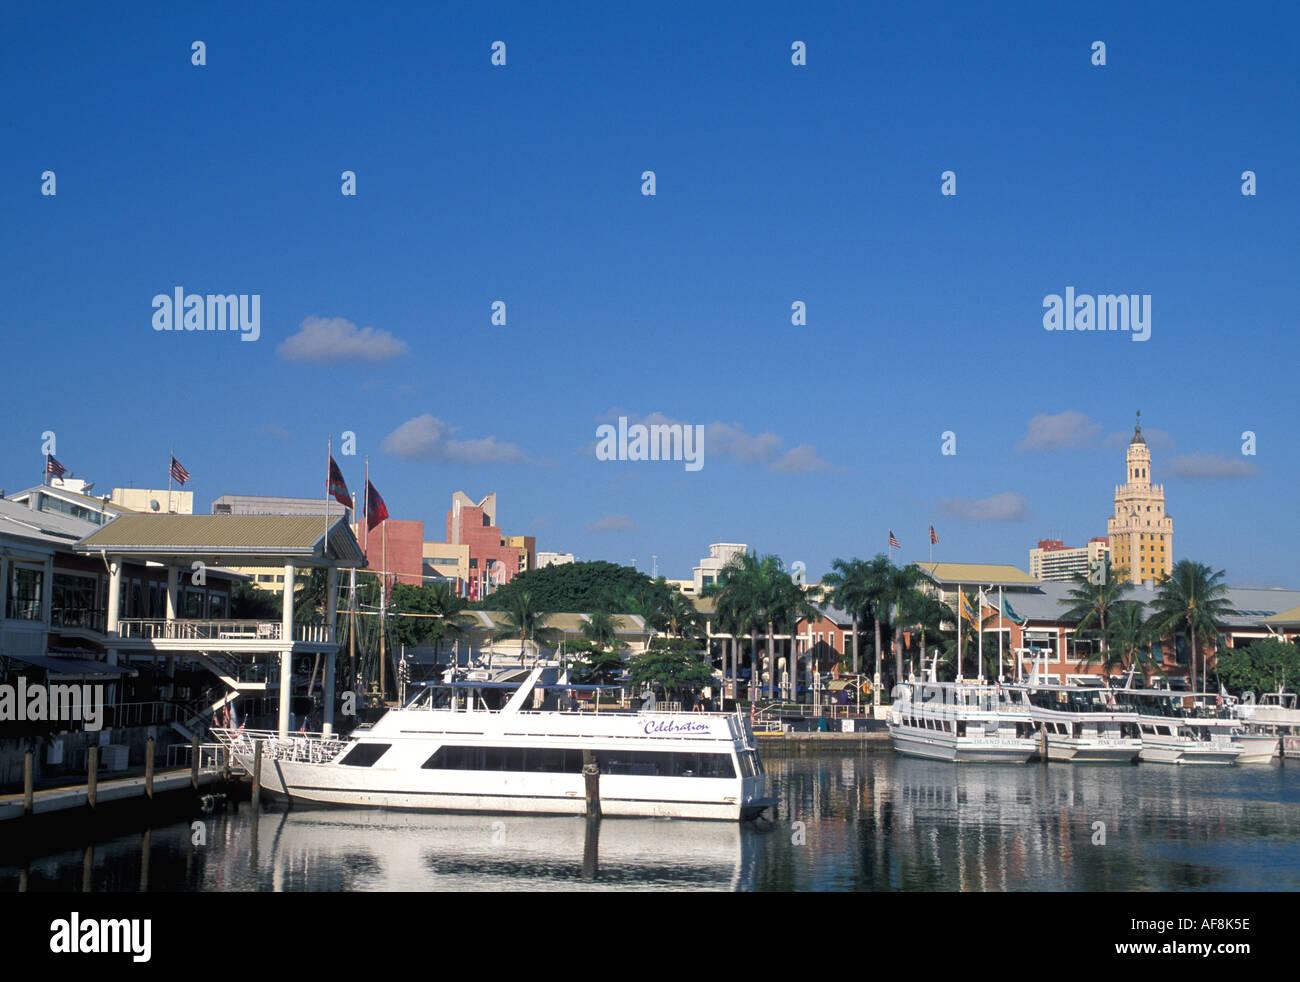 Miami Beach FL Florida Bayside South Beach Boats at anchor in marina - Stock Image